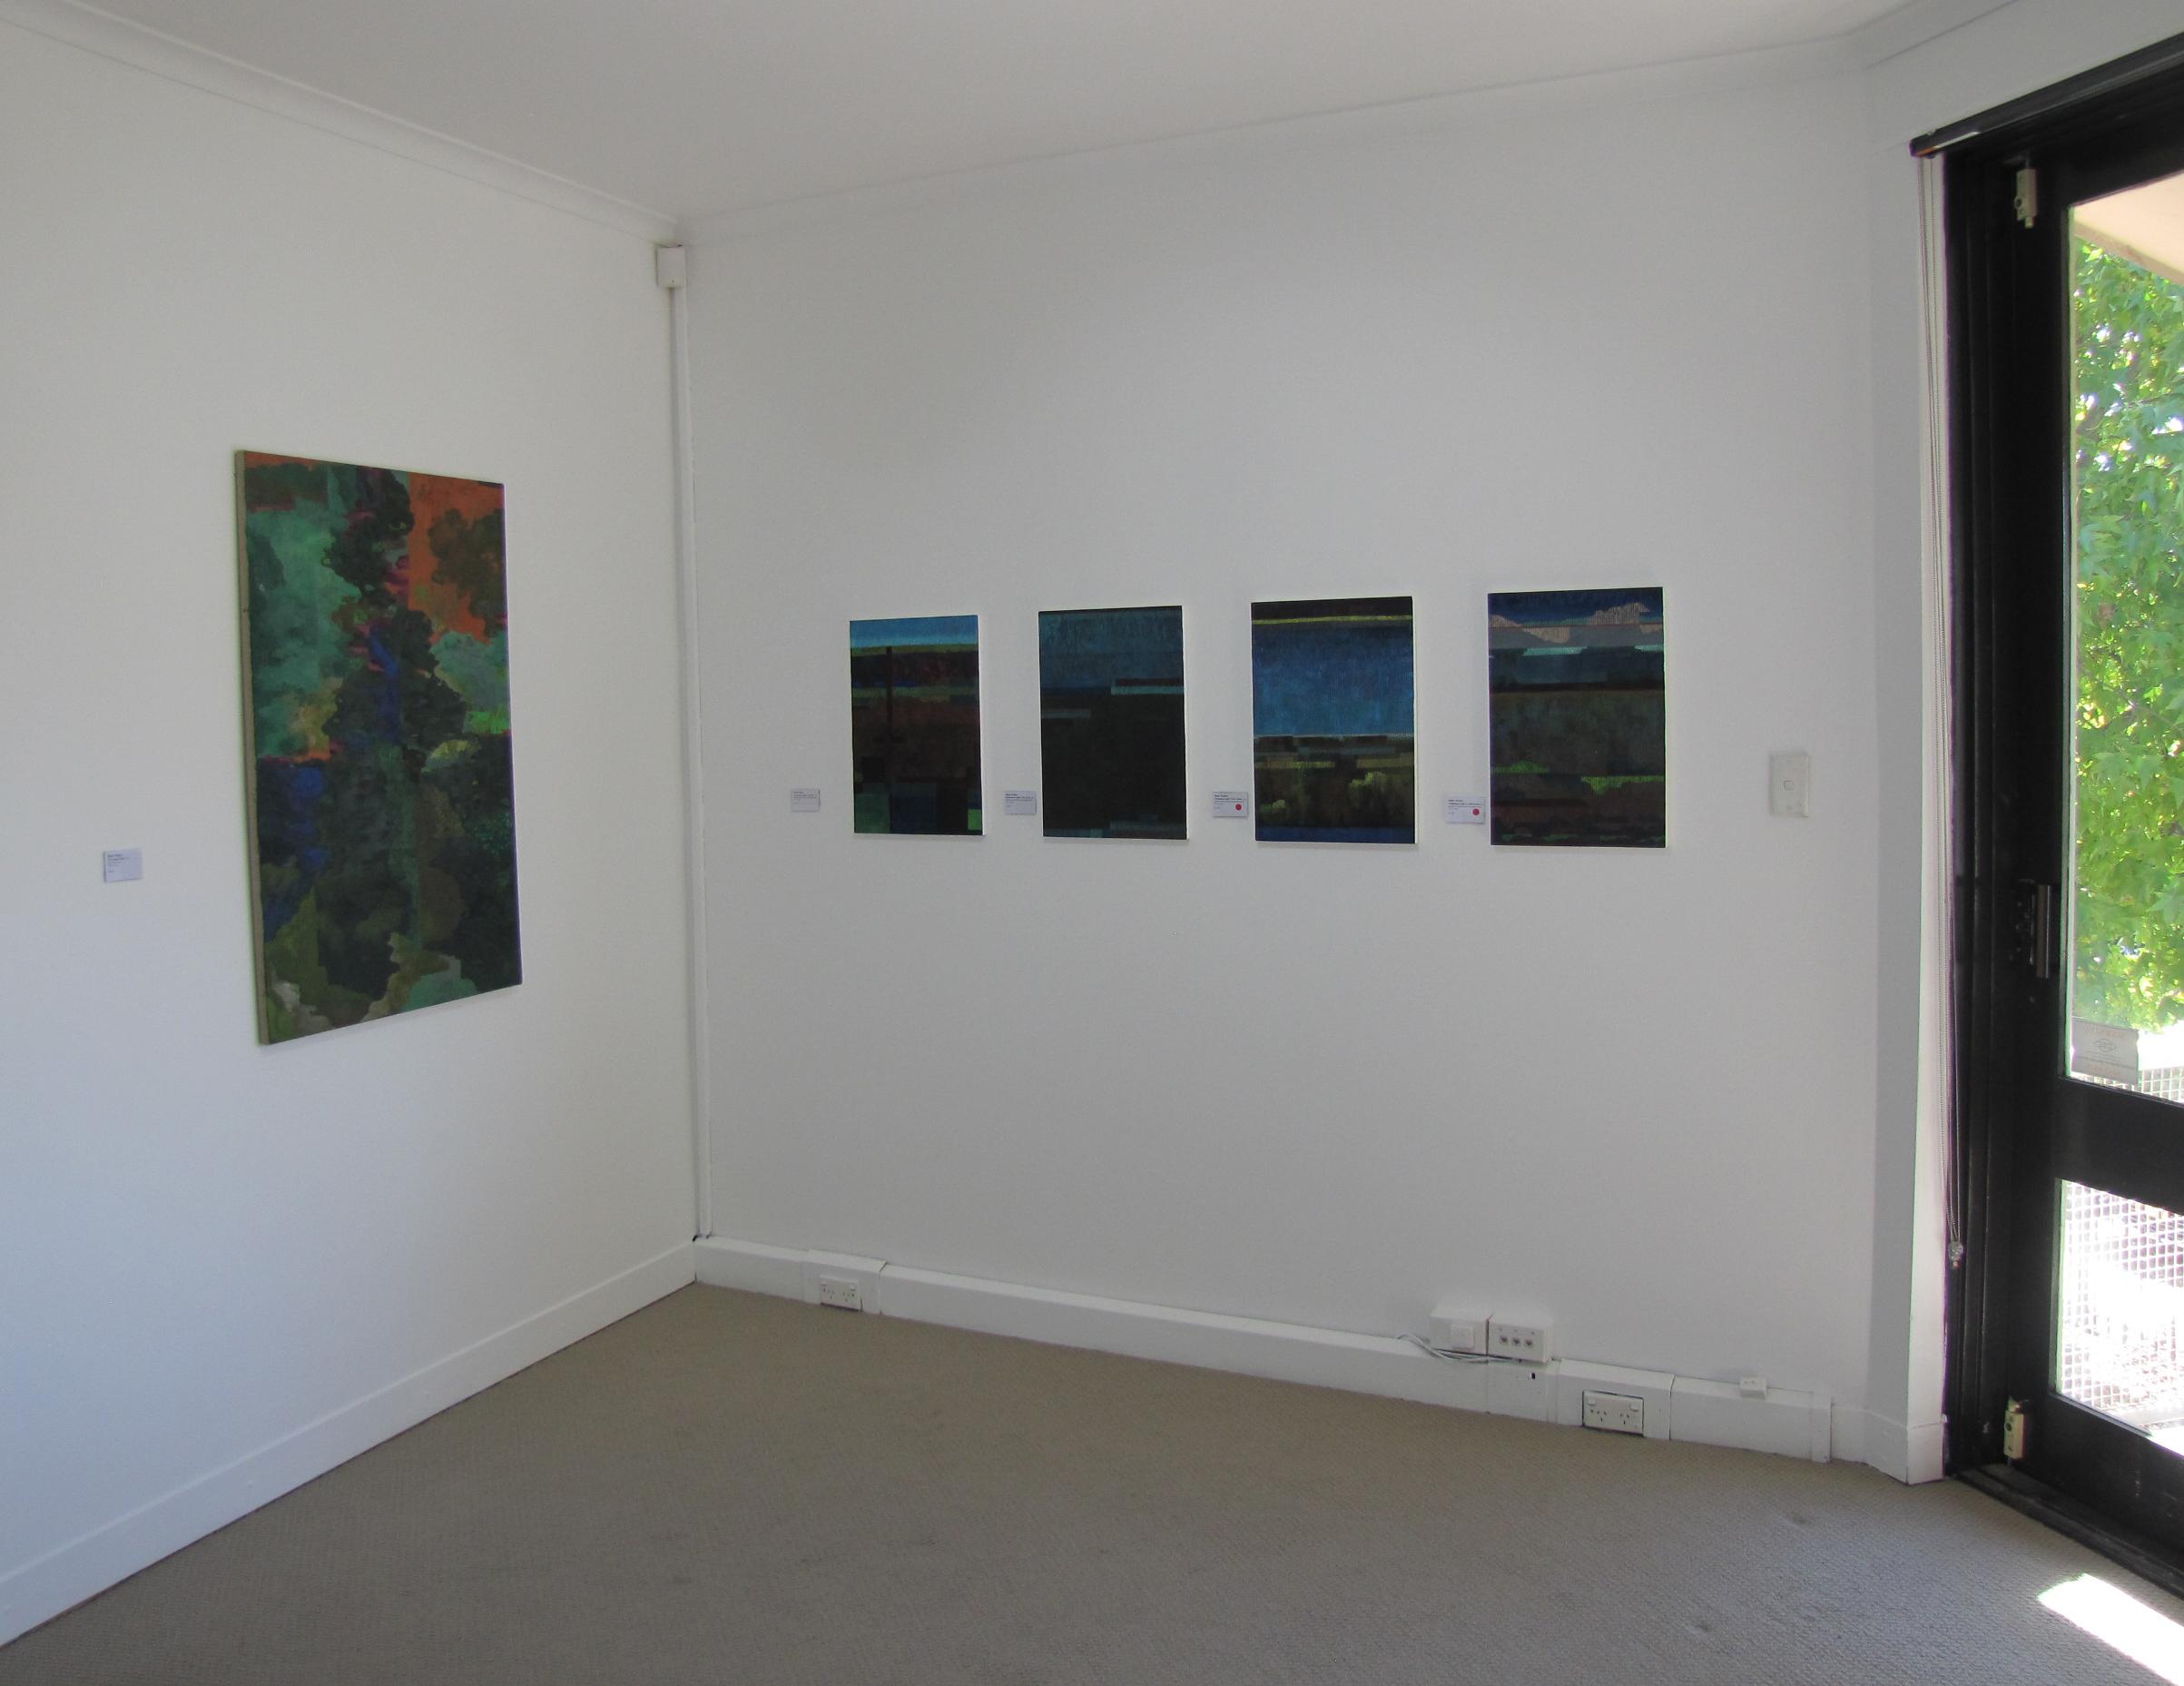 NSG. Waller 2 exhibition. Exhibition views 10.jpg